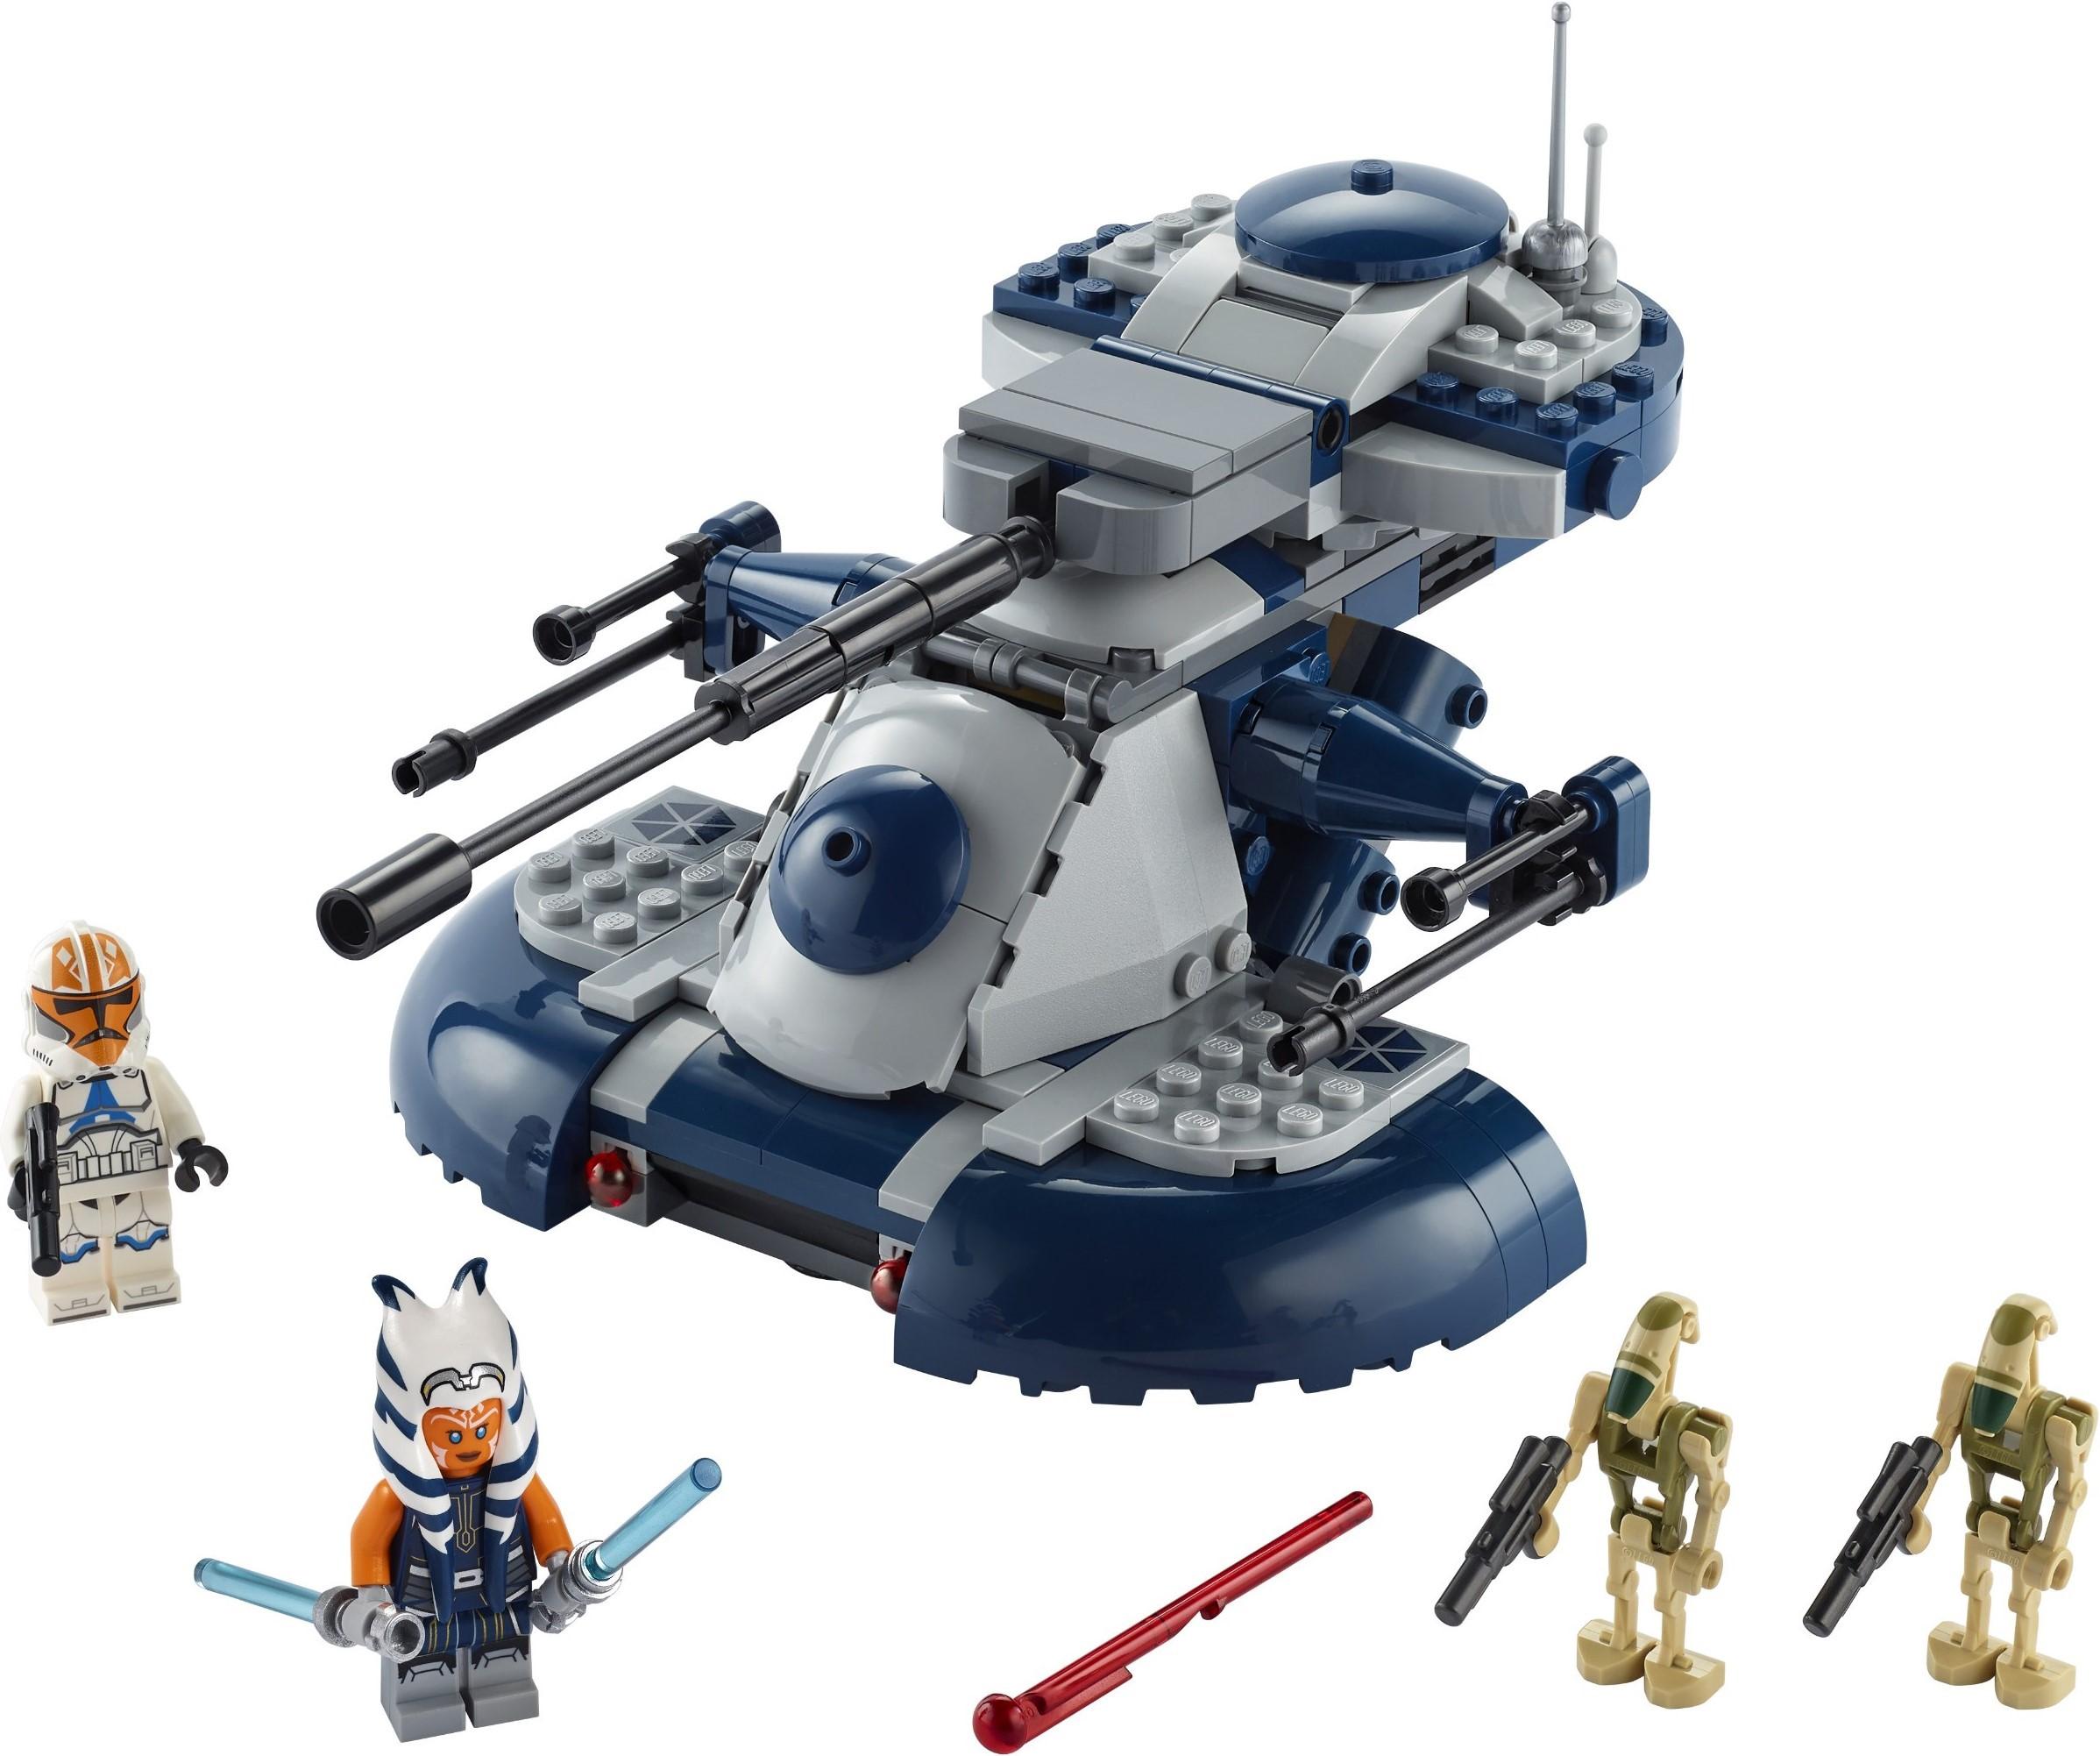 lego star wars 2020 armoured assault tank